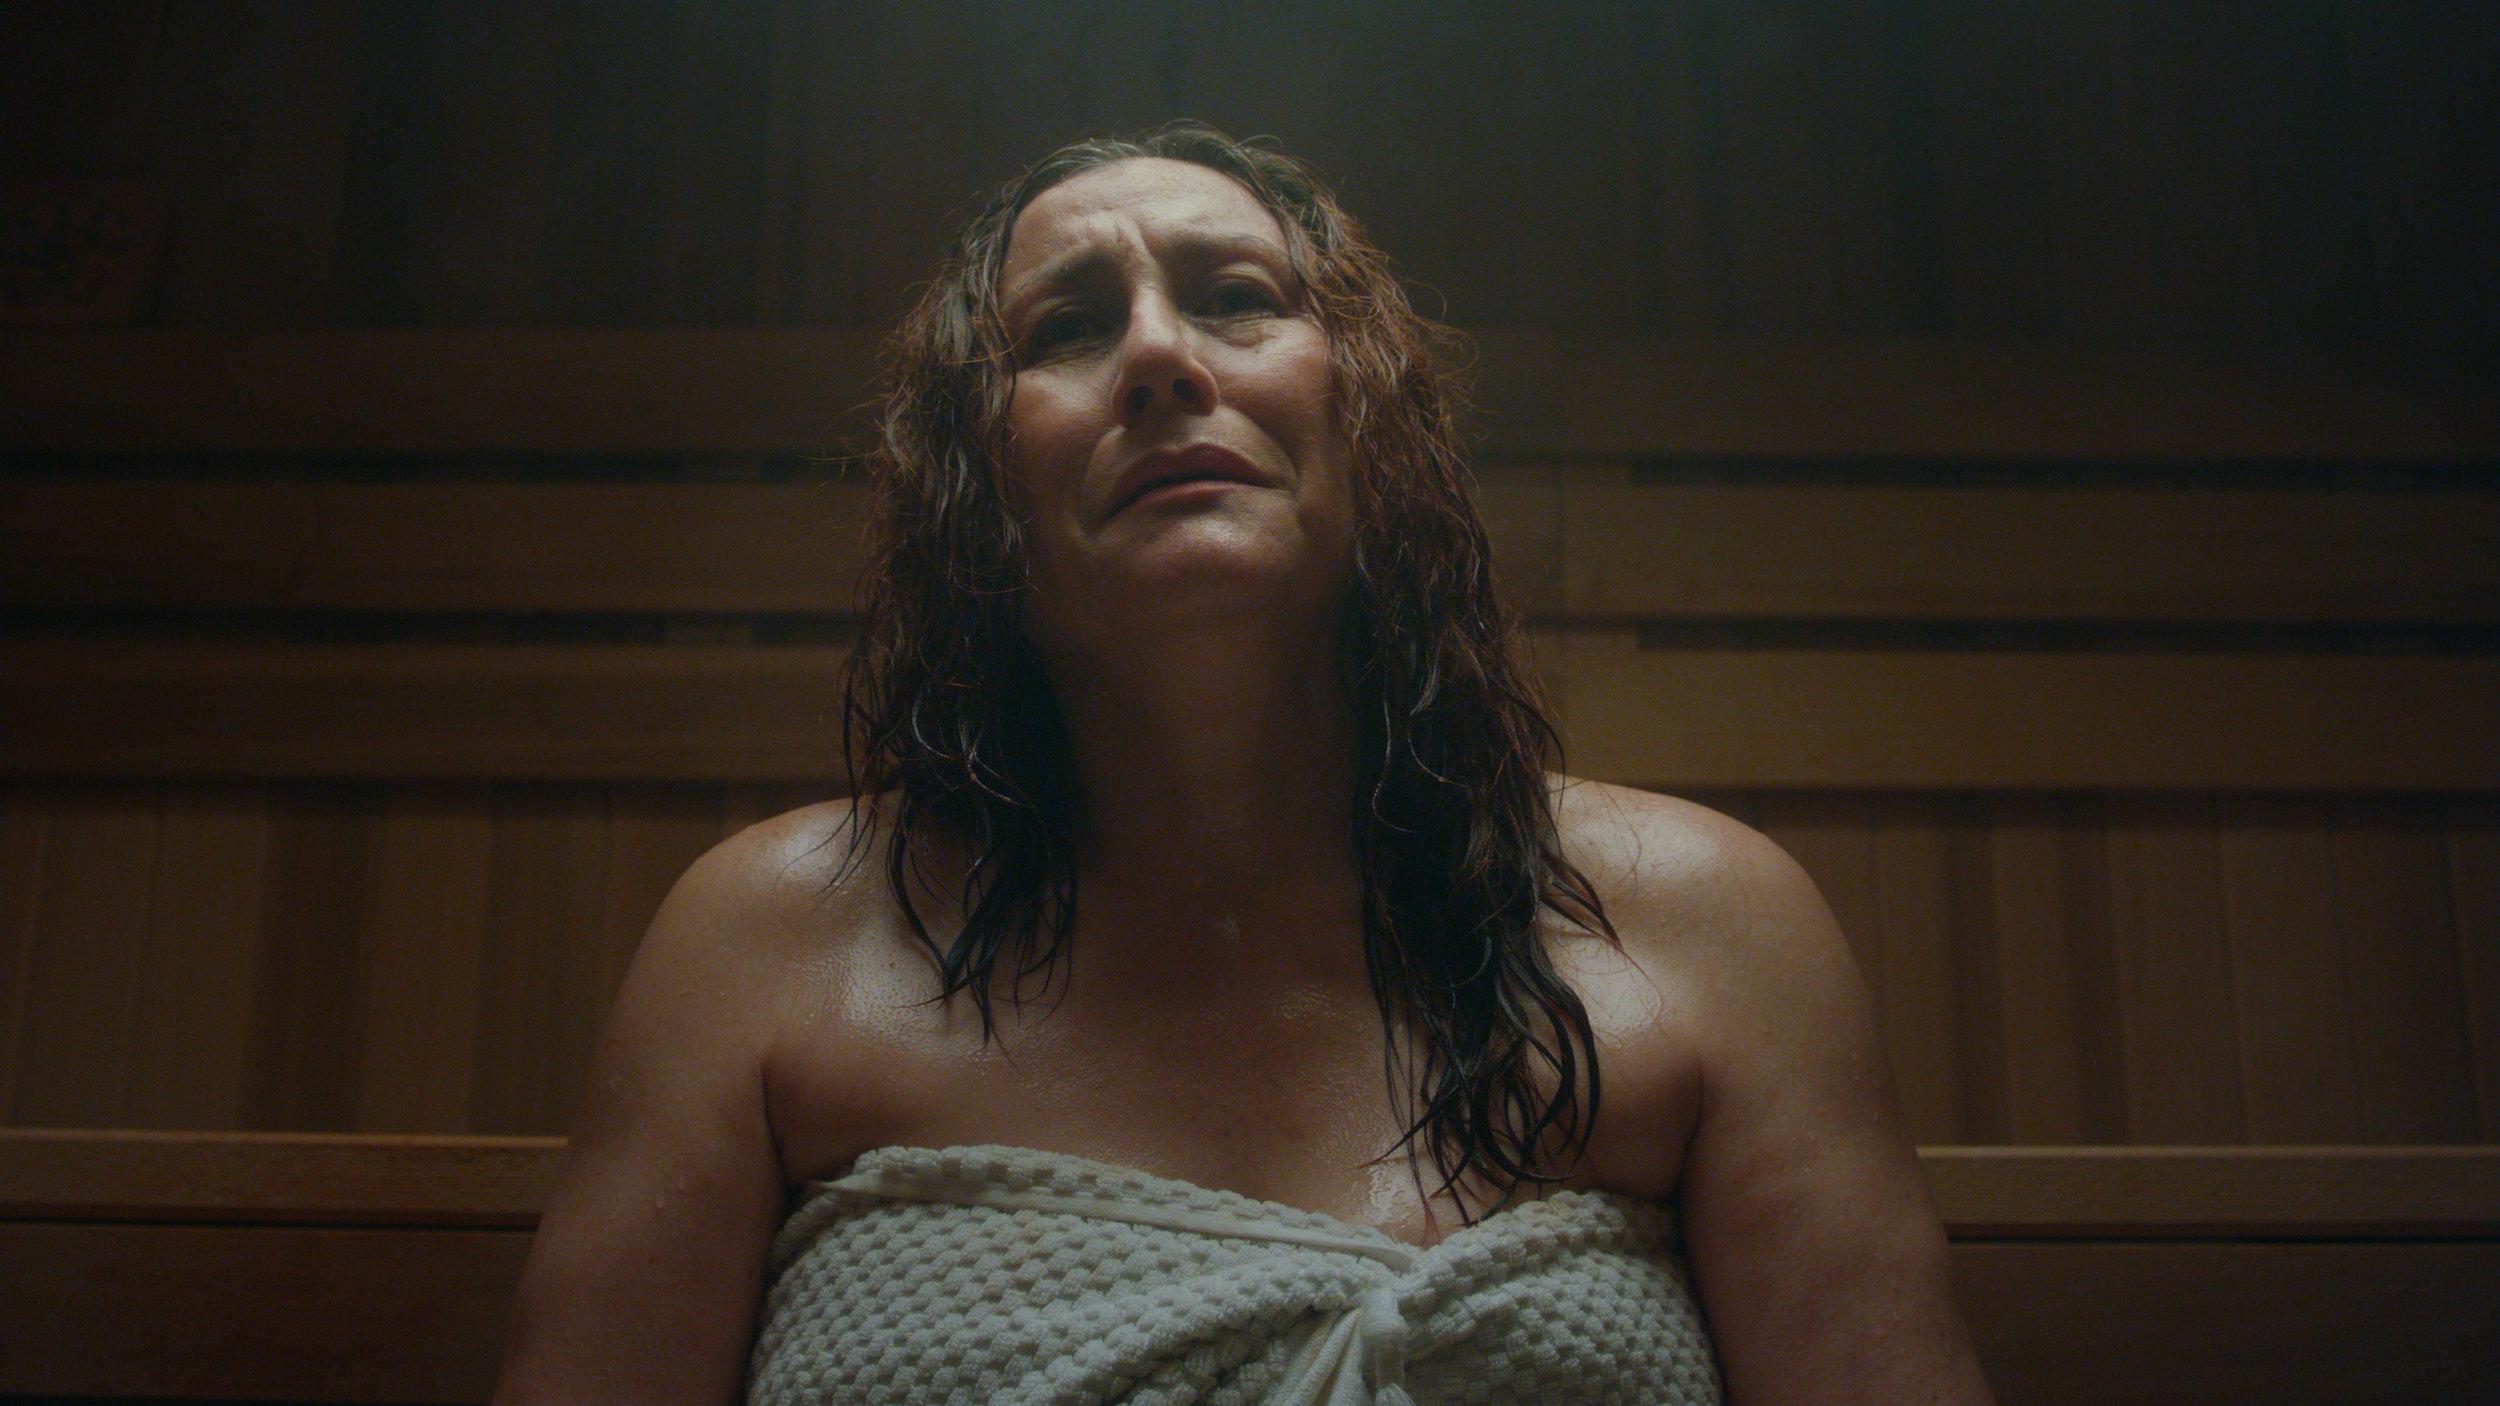 Teresa In sauna.jpg